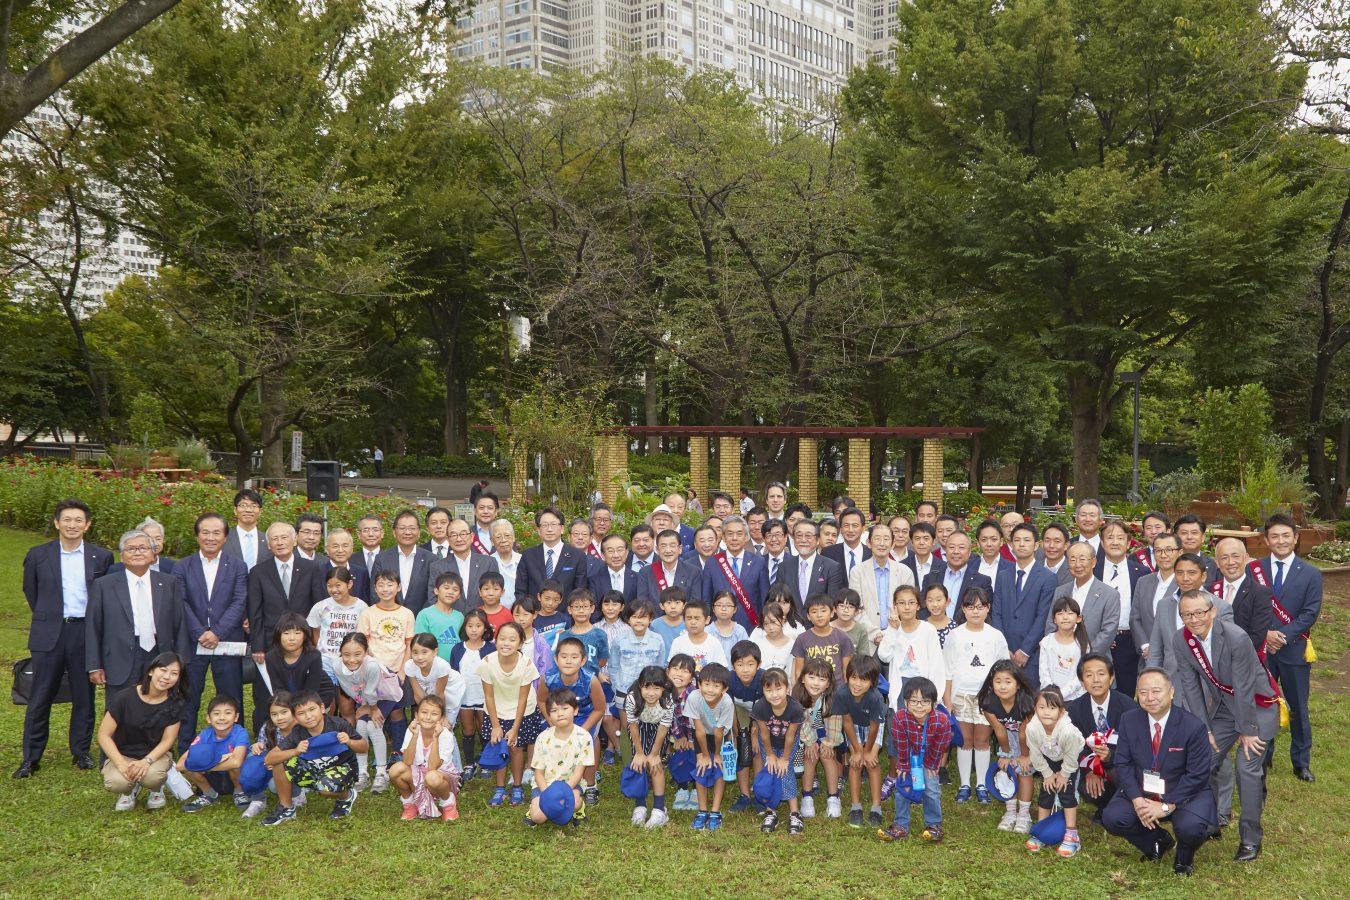 30周年記念事業 SMILE&DREAM Garden 寄贈式